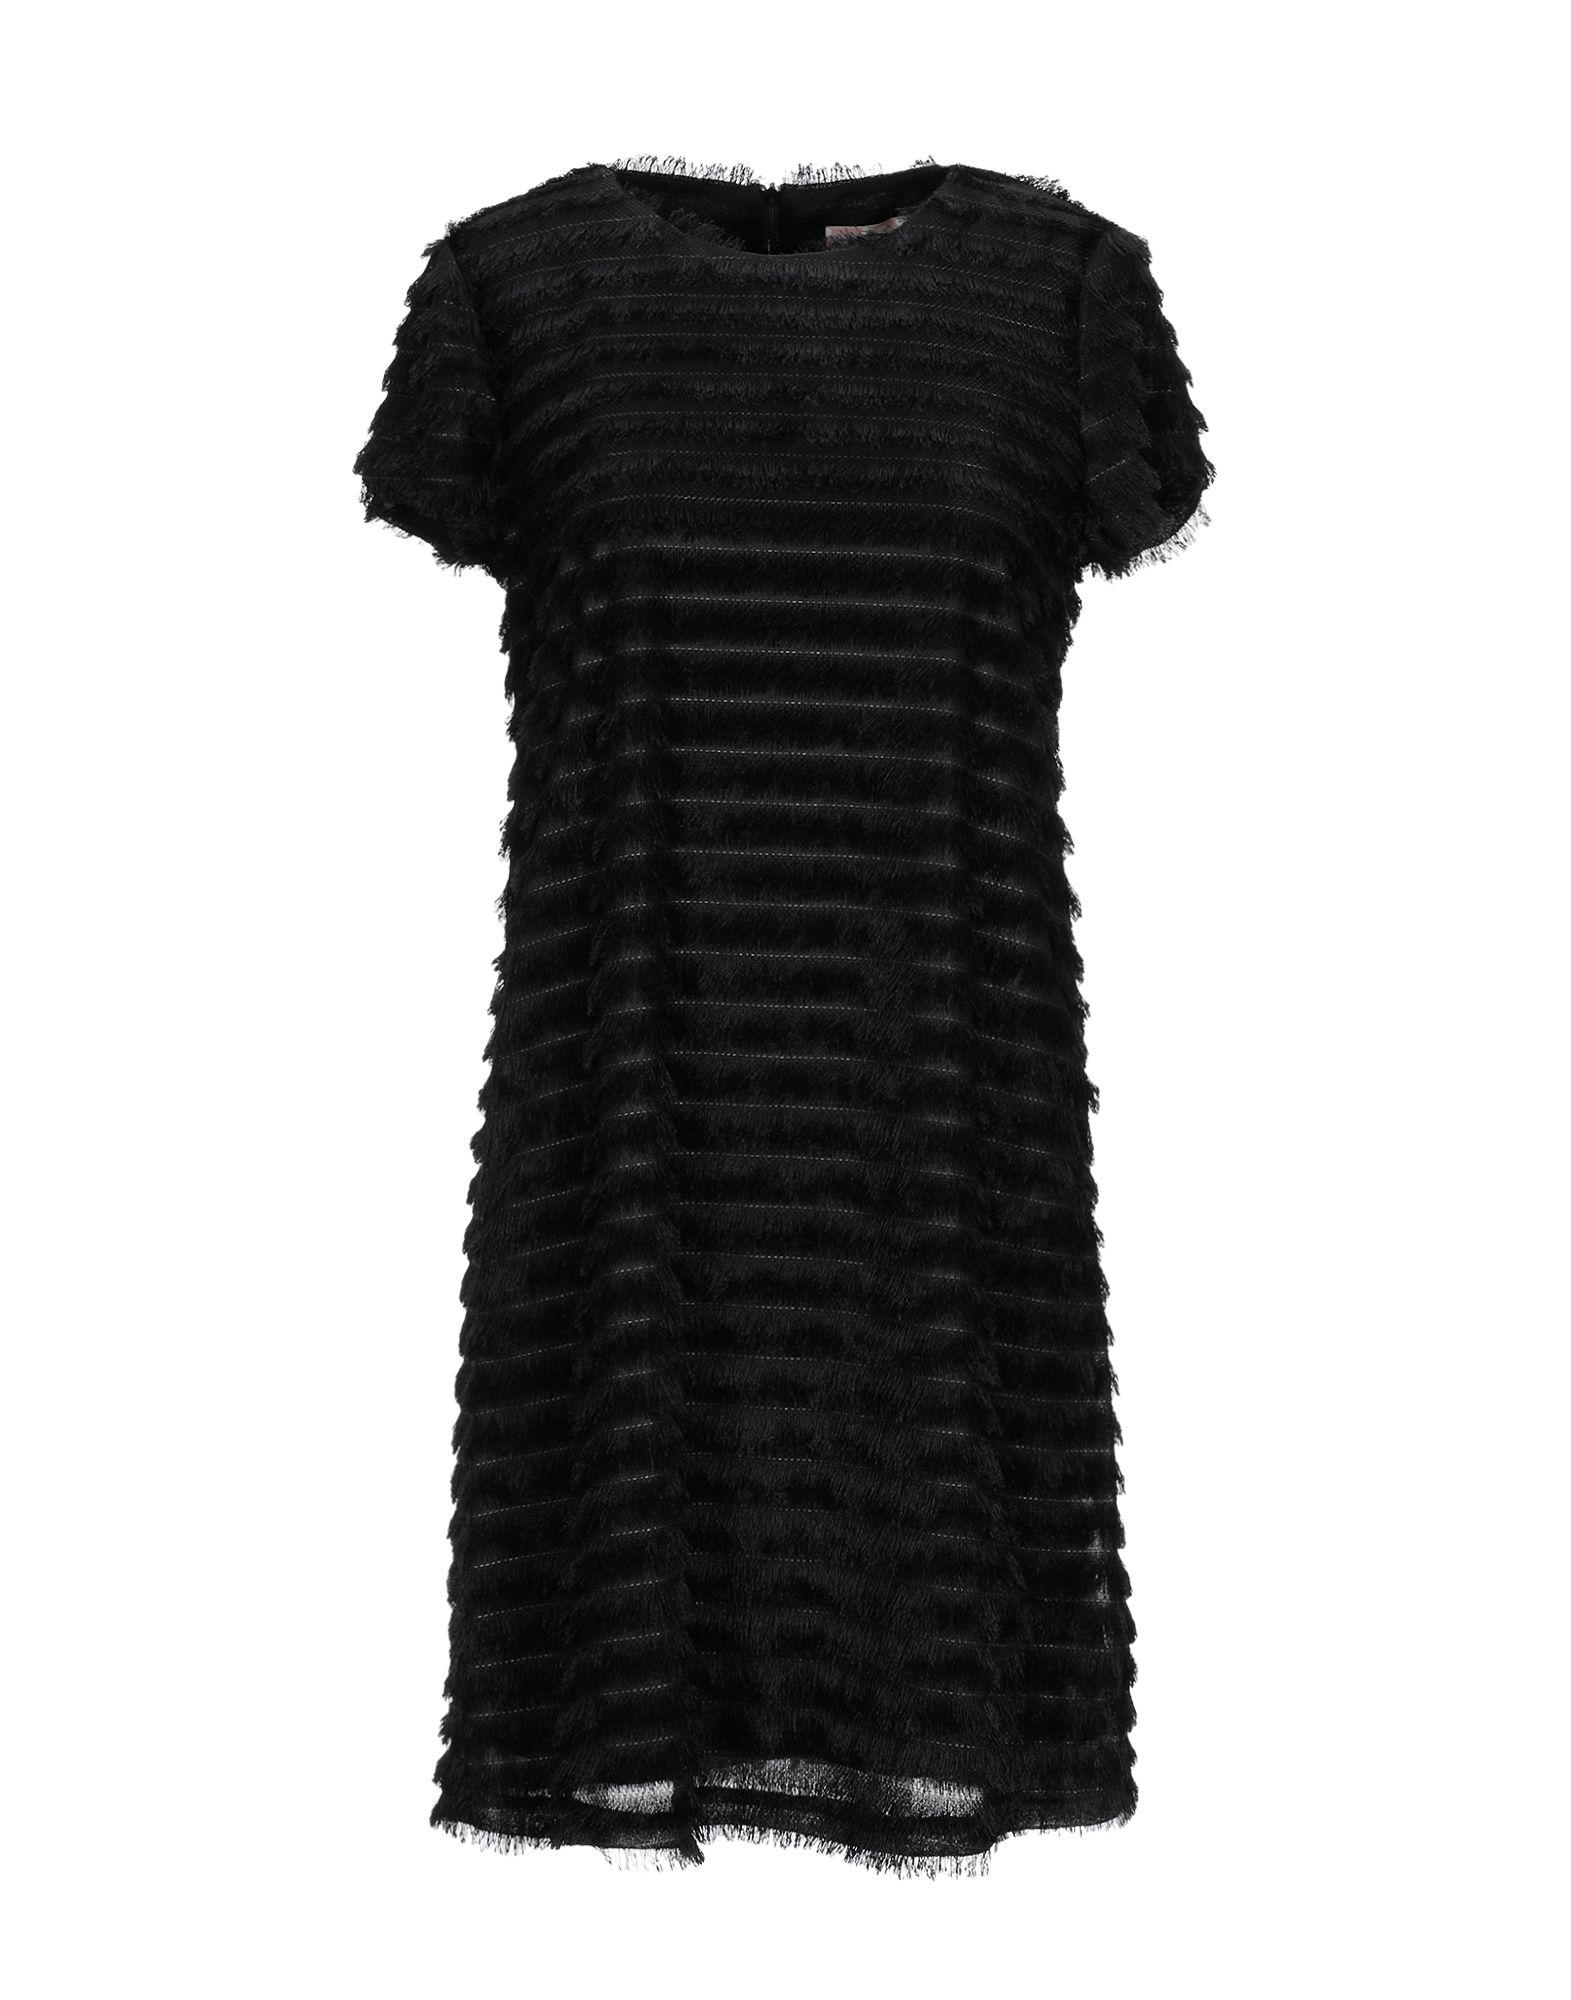 31f61948a3f6 TRAFFIC PEOPLE - Γυναικεία Κοντά Φορέματα - Yoox